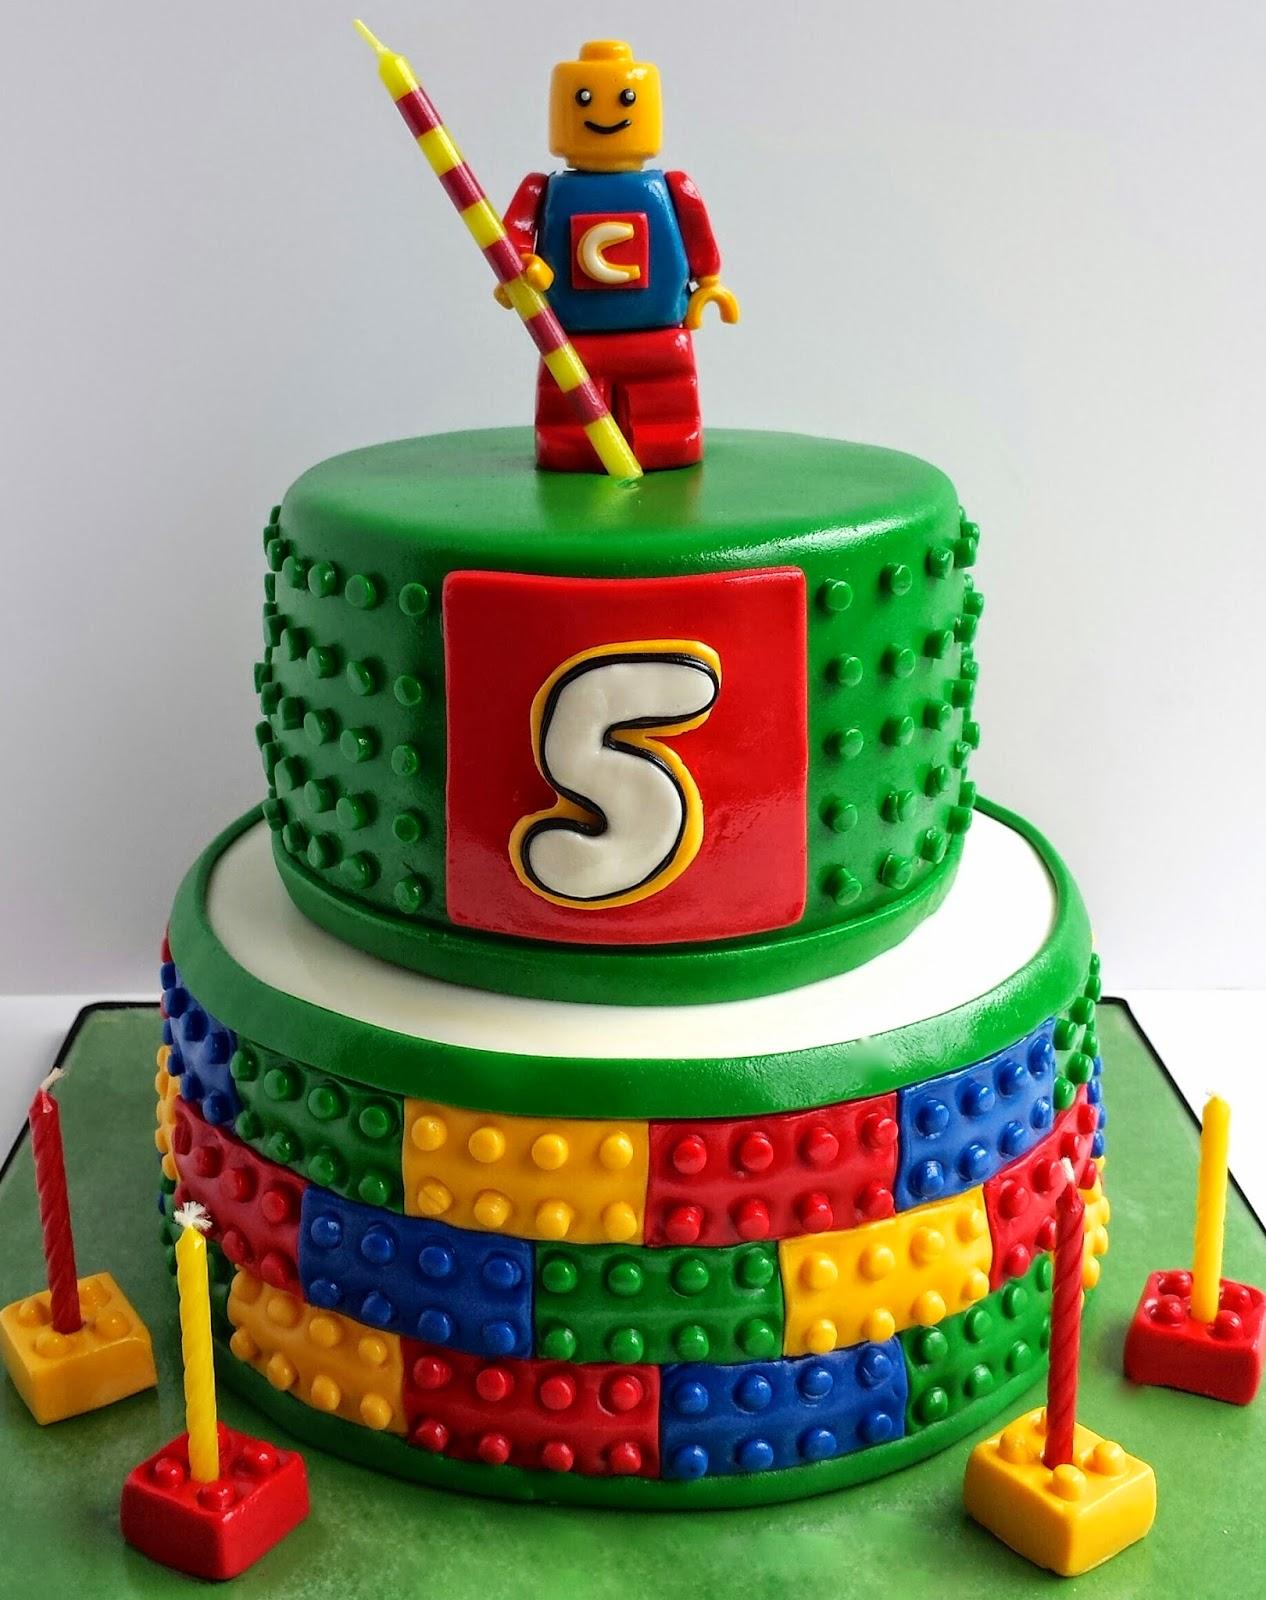 Birthday Cake Ideas Lego : Cake Blog: Lego Cake Tutorial